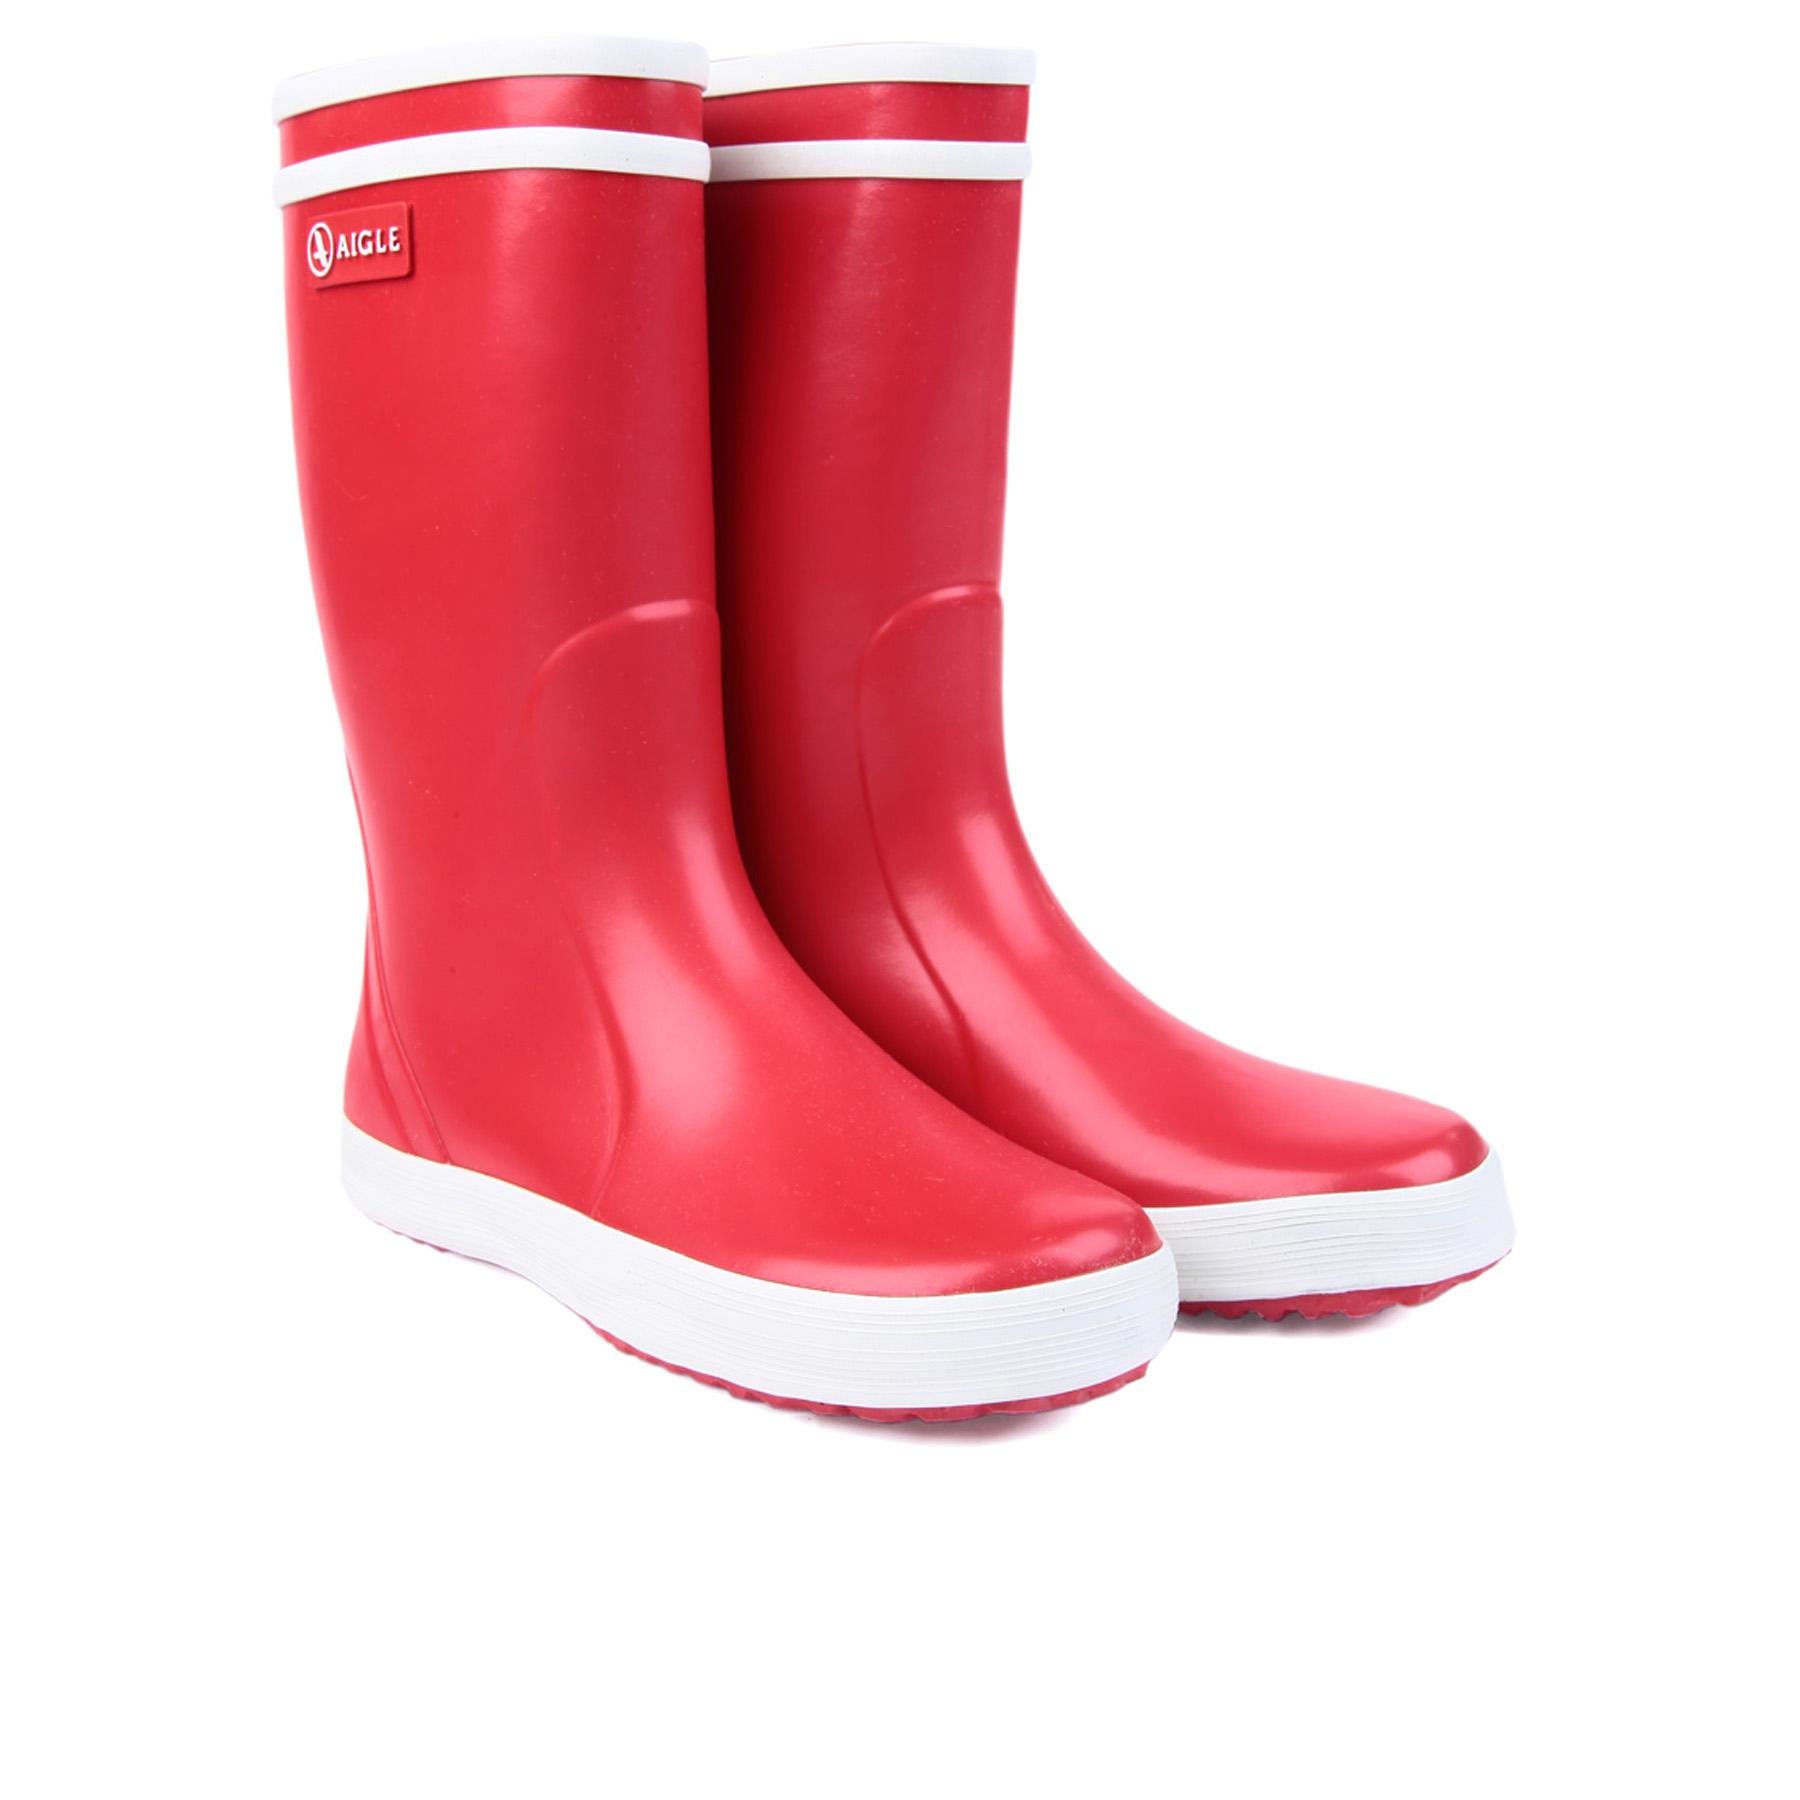 Aigle Lolly Pop Kid's Wellington Boots